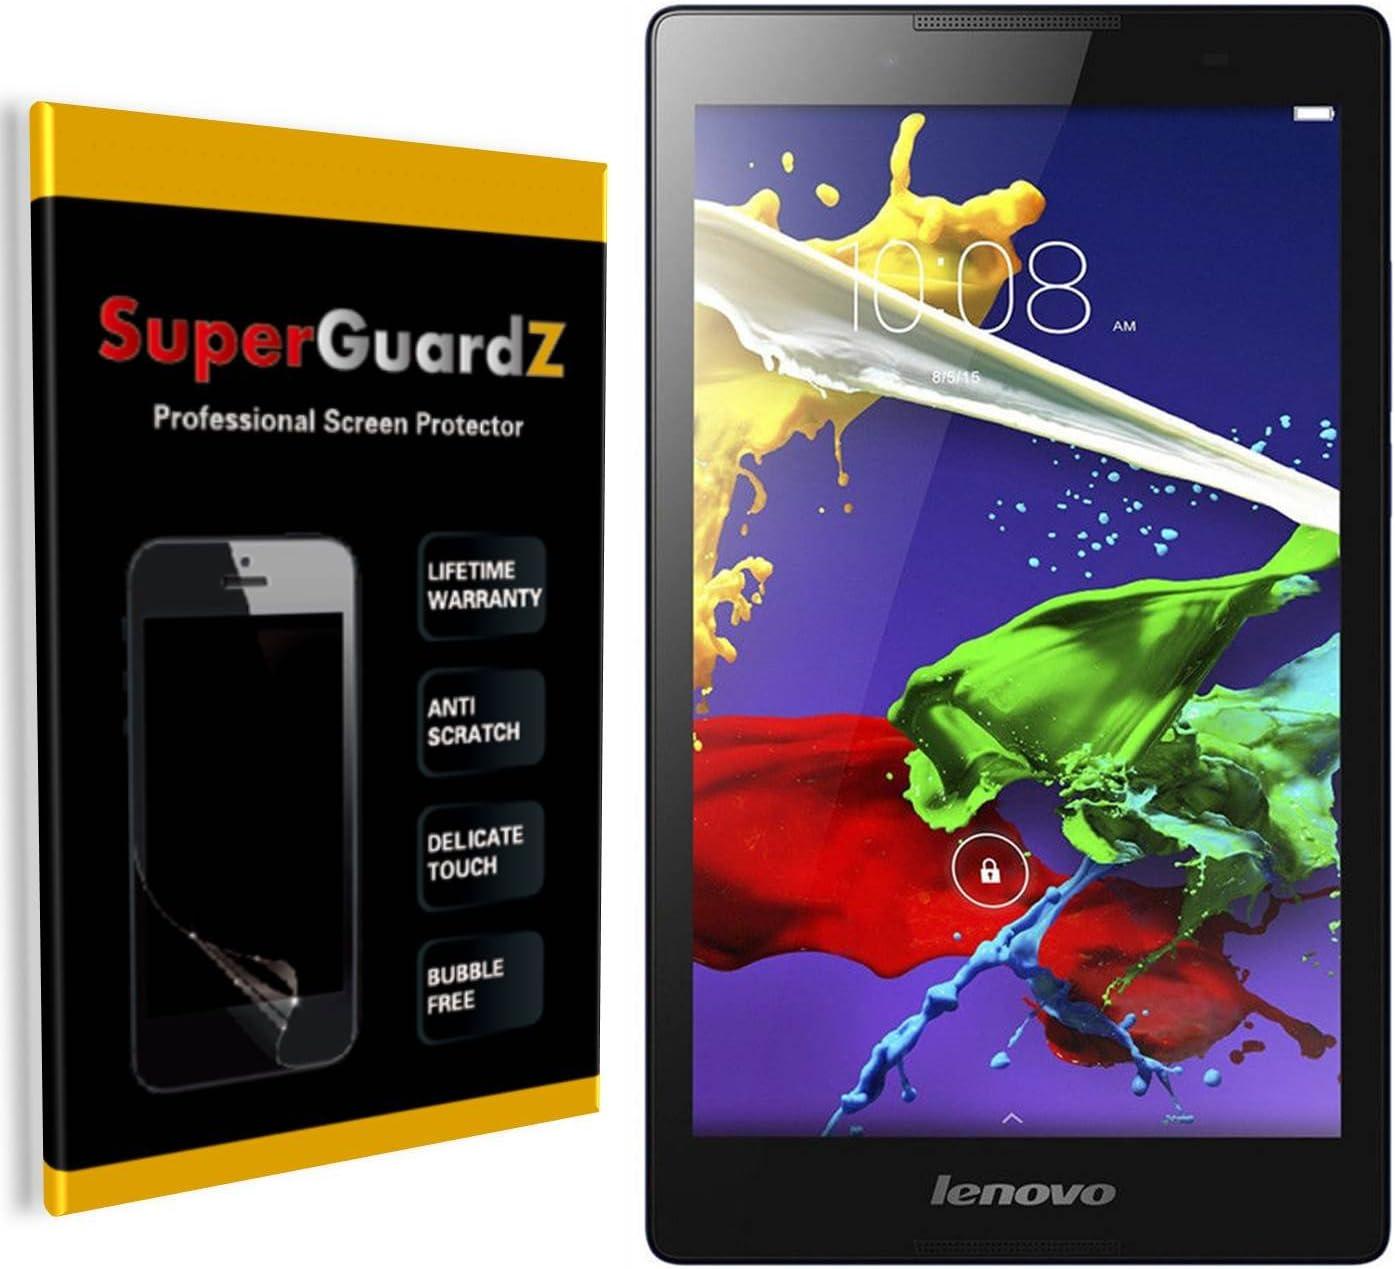 [3-Pack] for Lenovo Tab 2 A8-50 - SuperGuardZ Screen Protector, Anti-Glare, Matte, Anti-Fingerprint, Anti-Scratch, Anti-Bubble